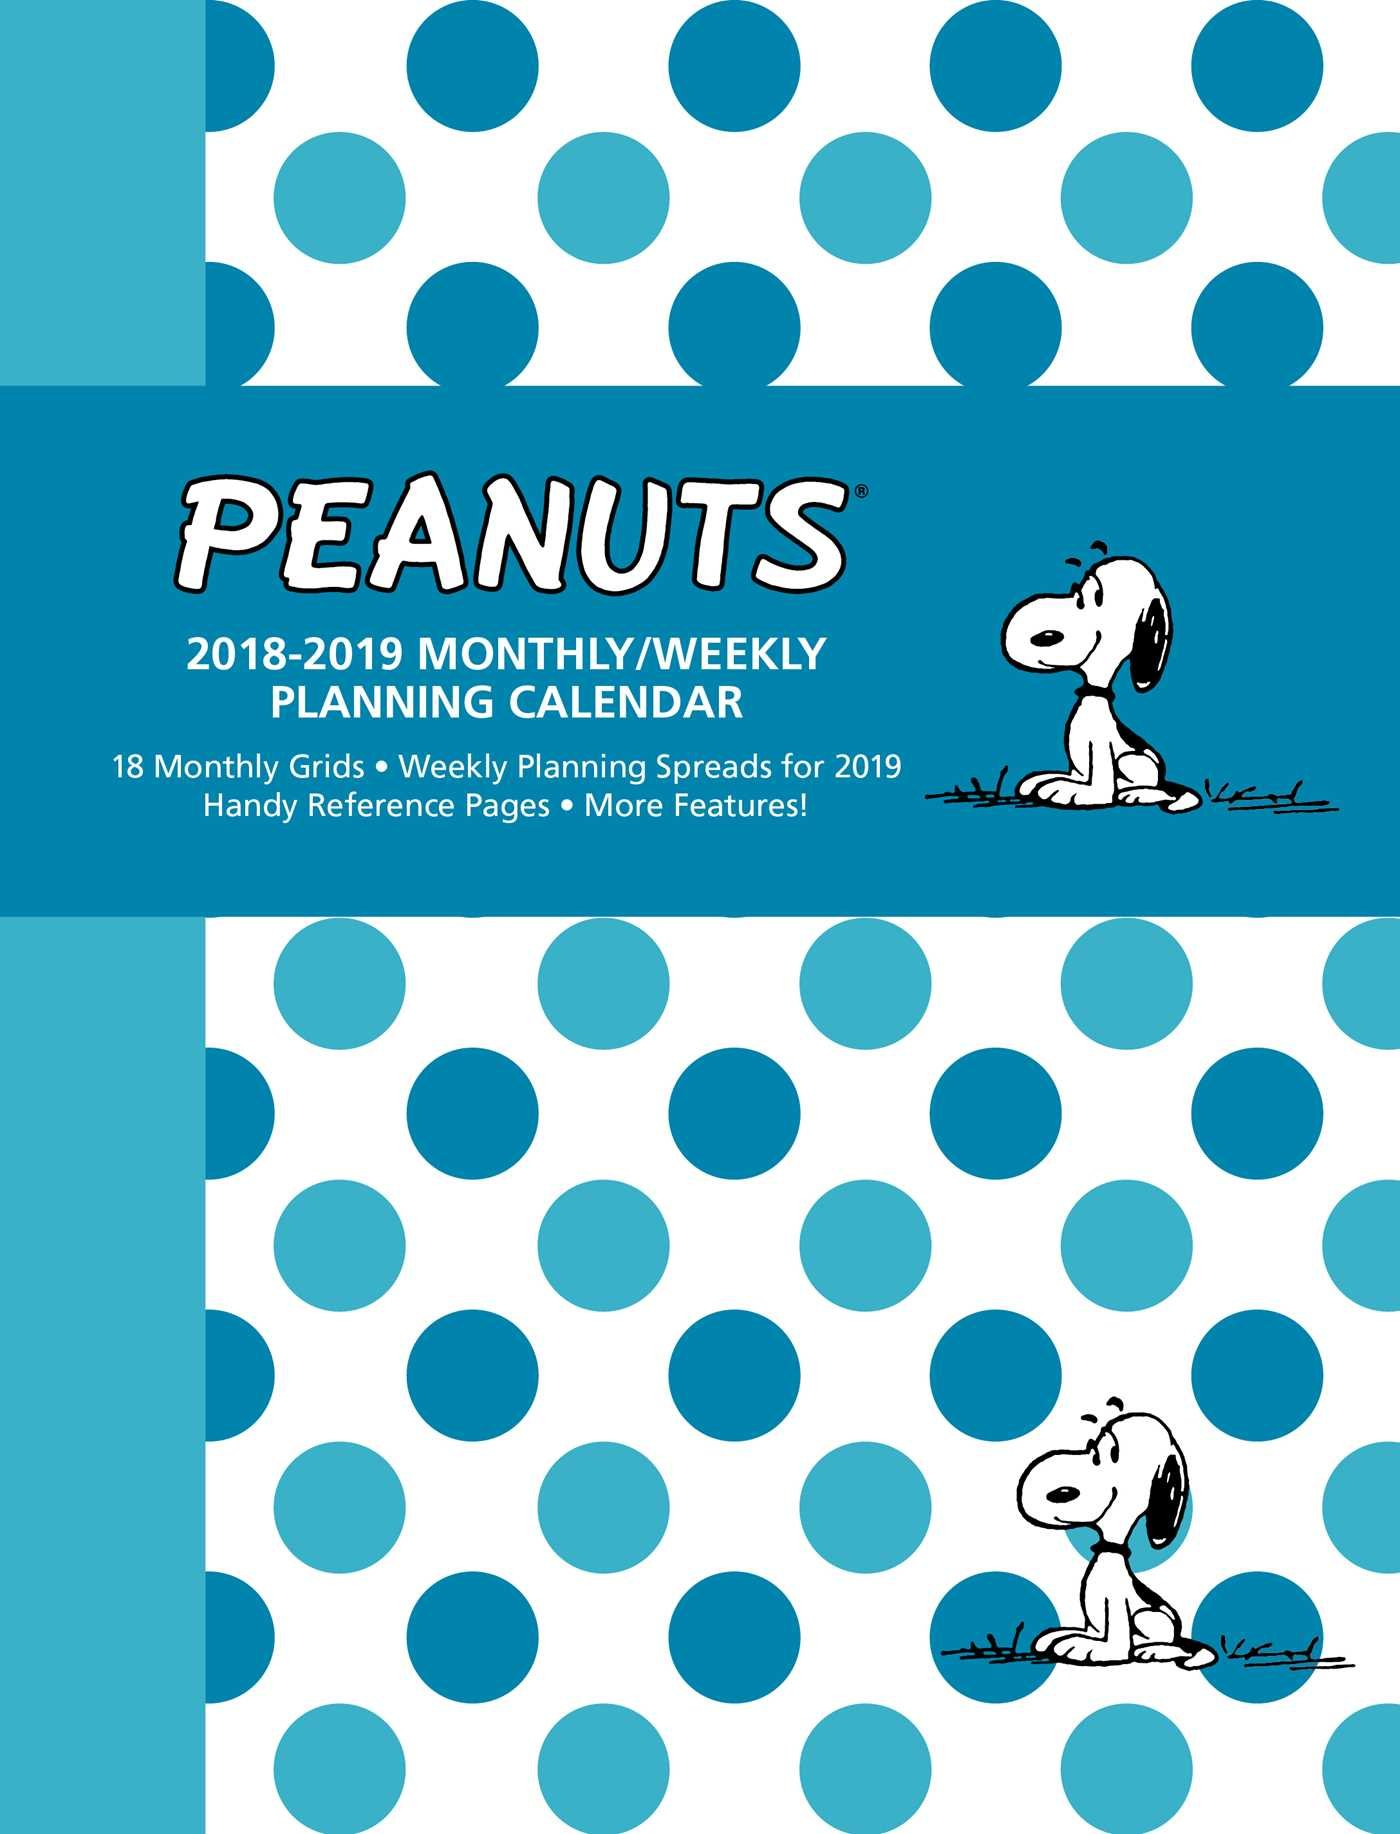 Peanuts 2018-2019 Monthly/Weekly Planning Calendar: Peanuts ...